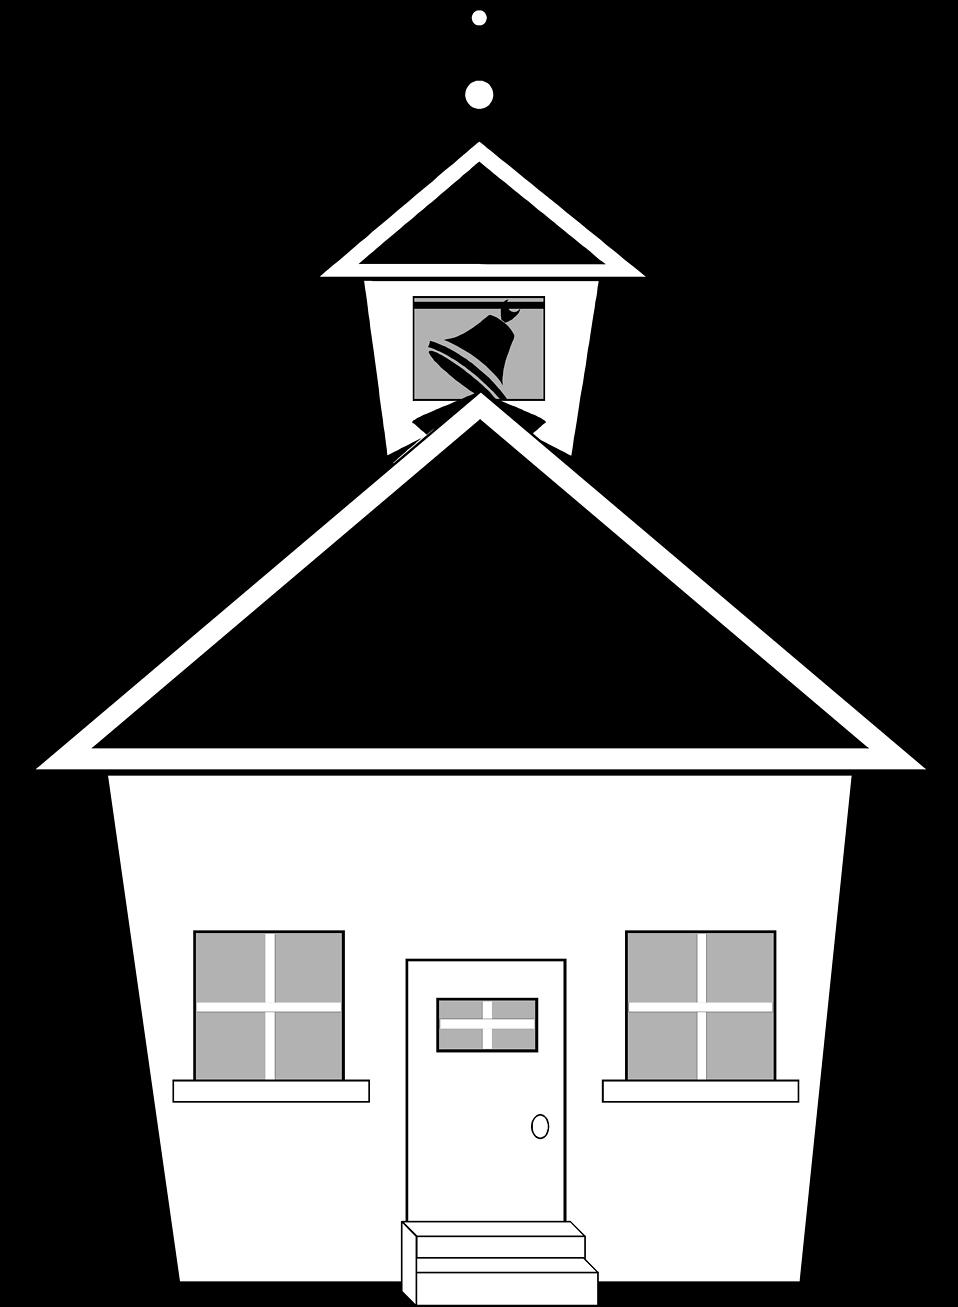 Schoolhouse clipart schhol. School free stock photo